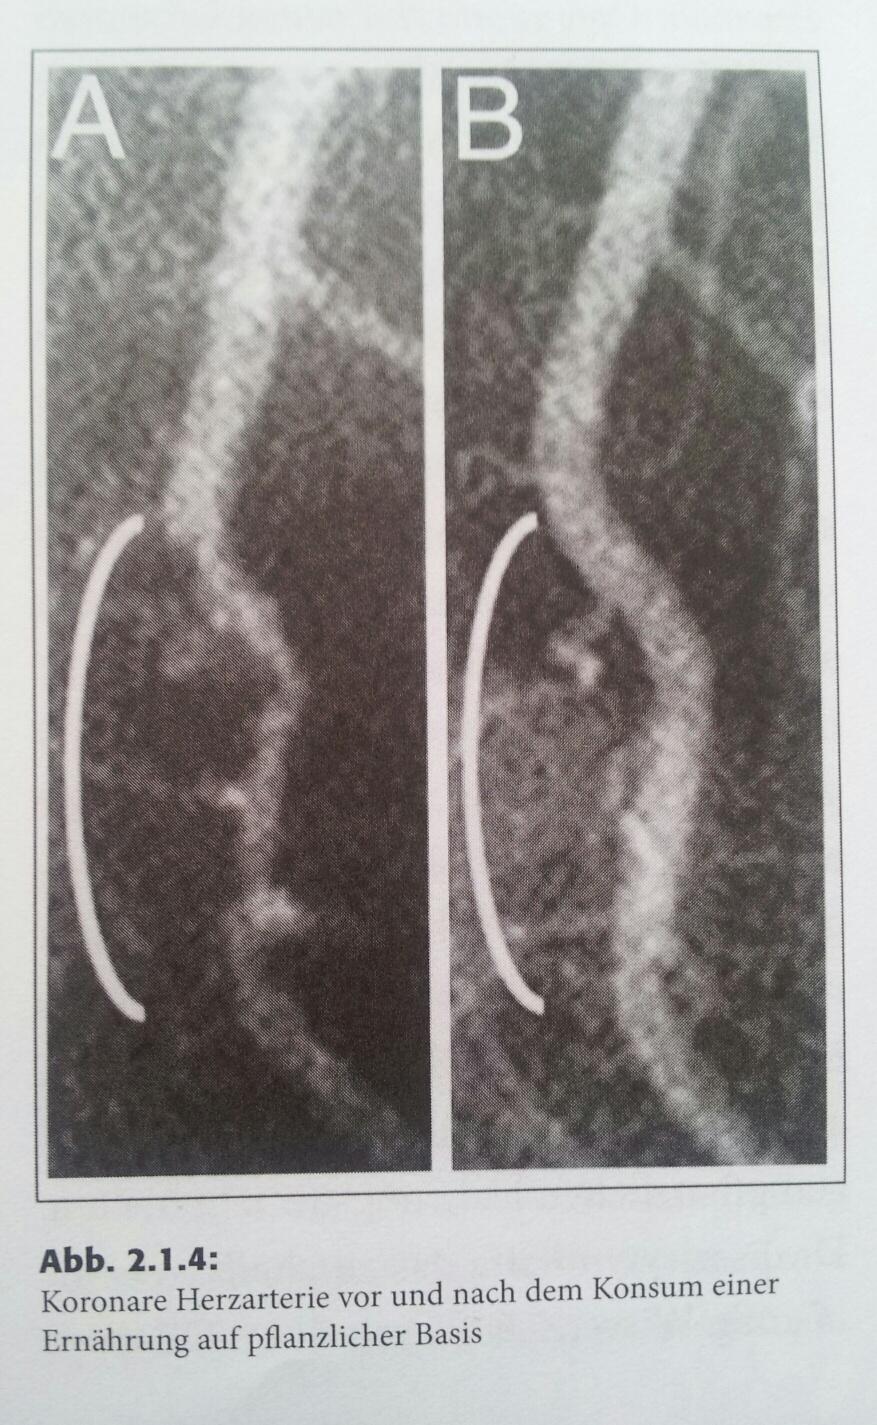 Koronare Herzarterie